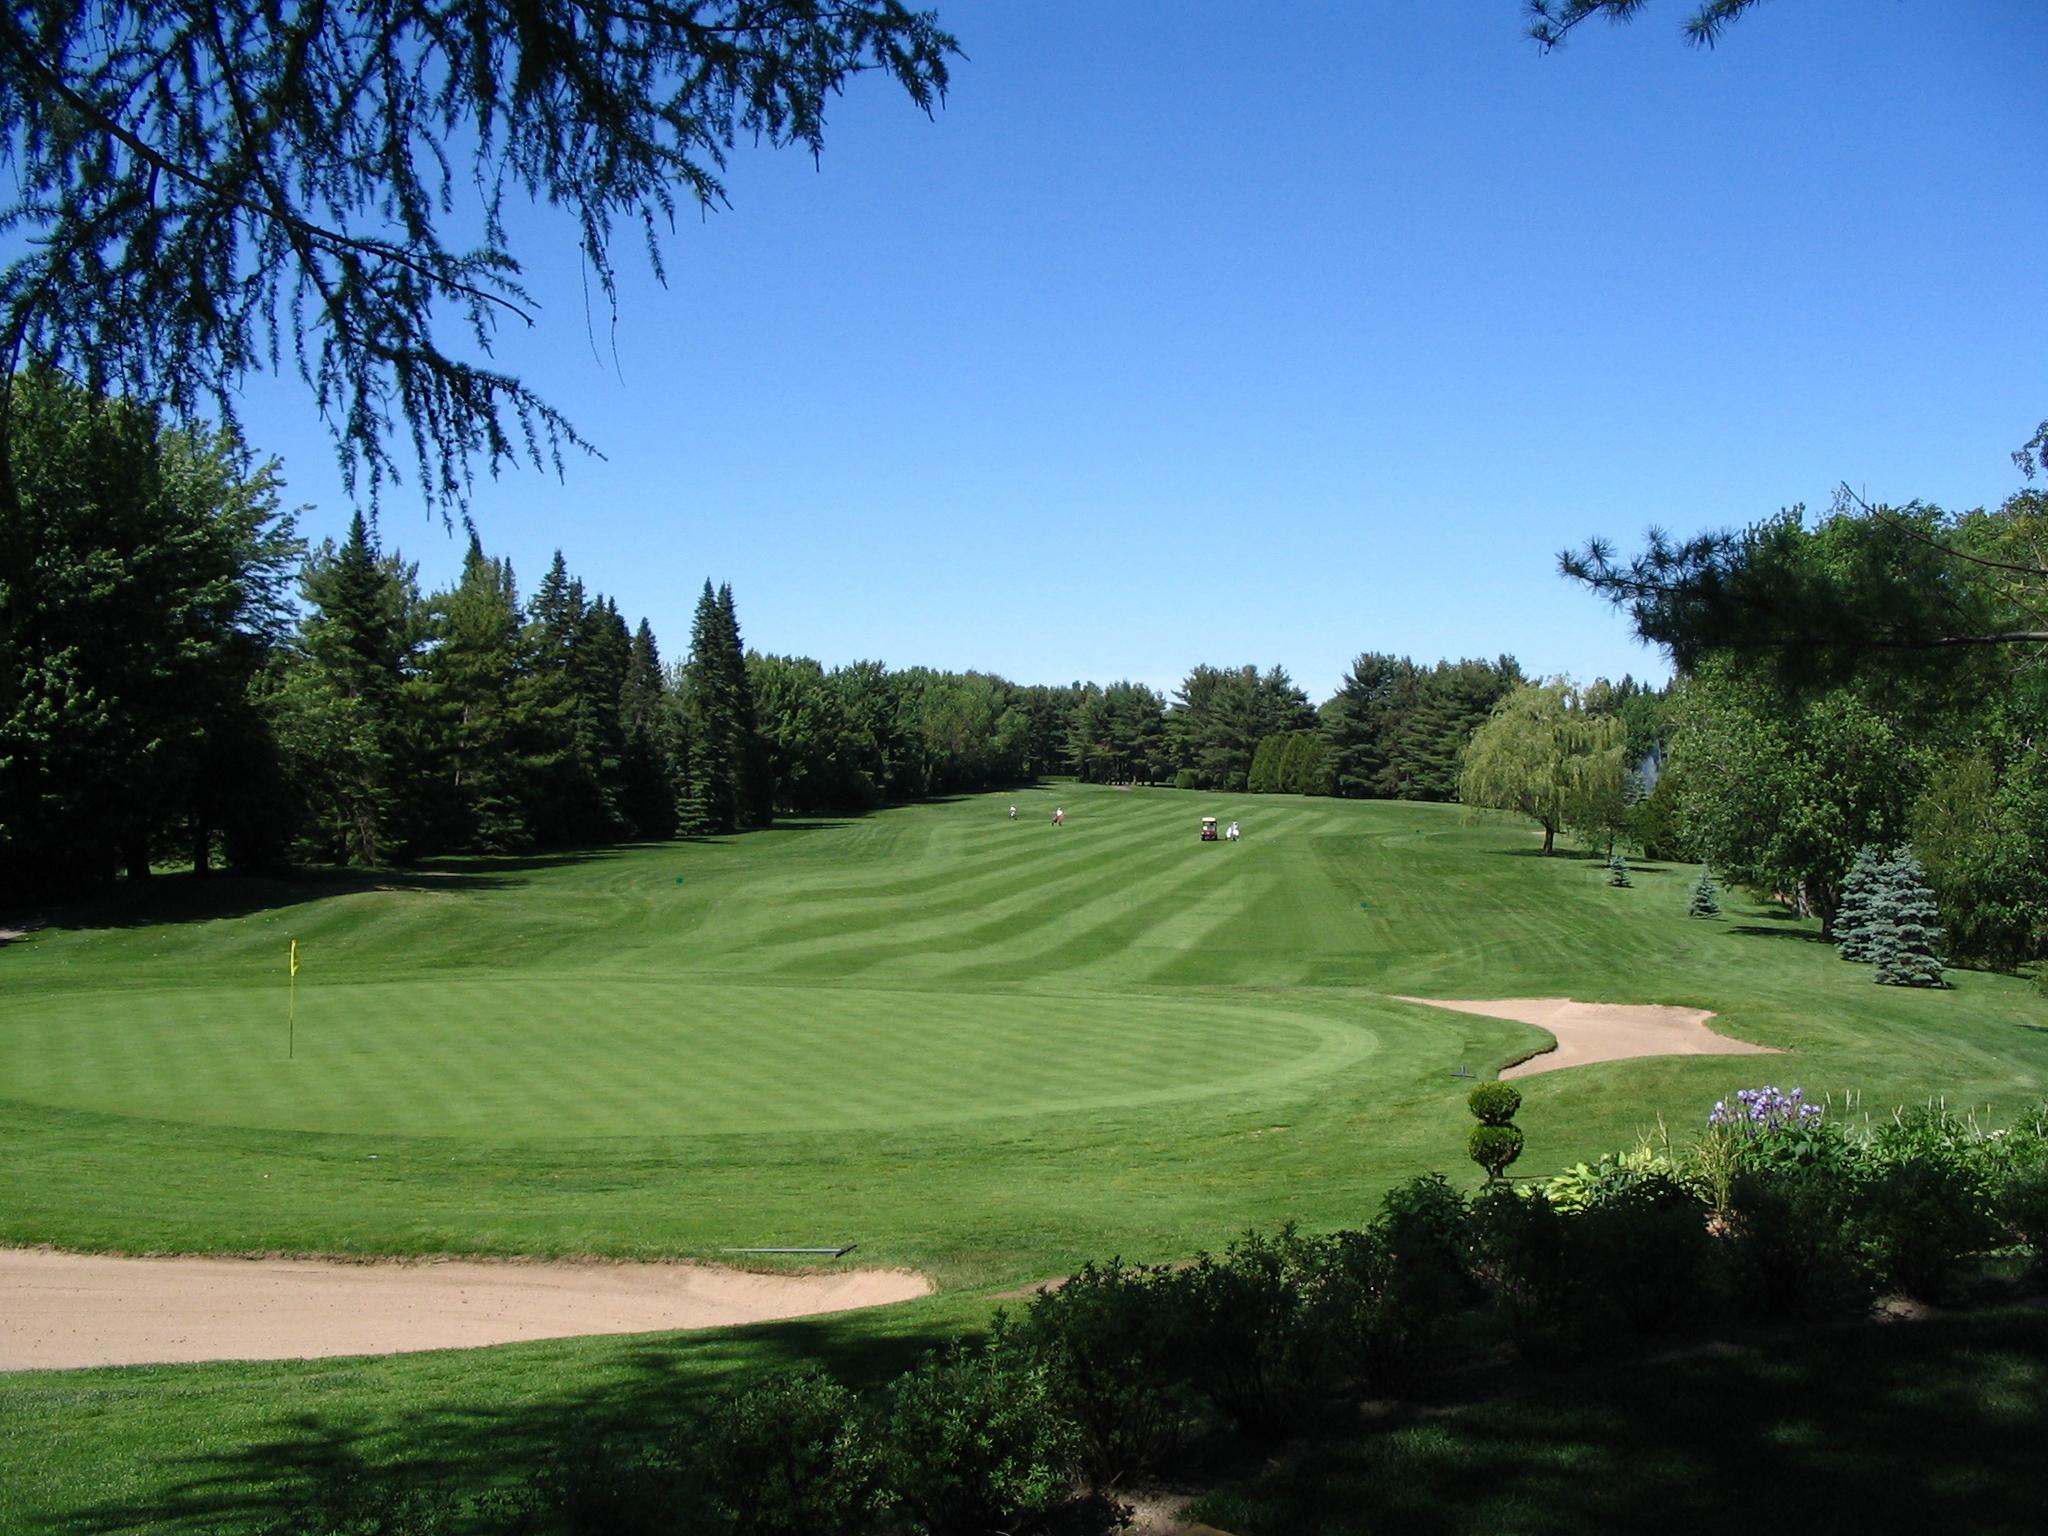 Club De Golf De Joliette Inc à St-Charl-Borr